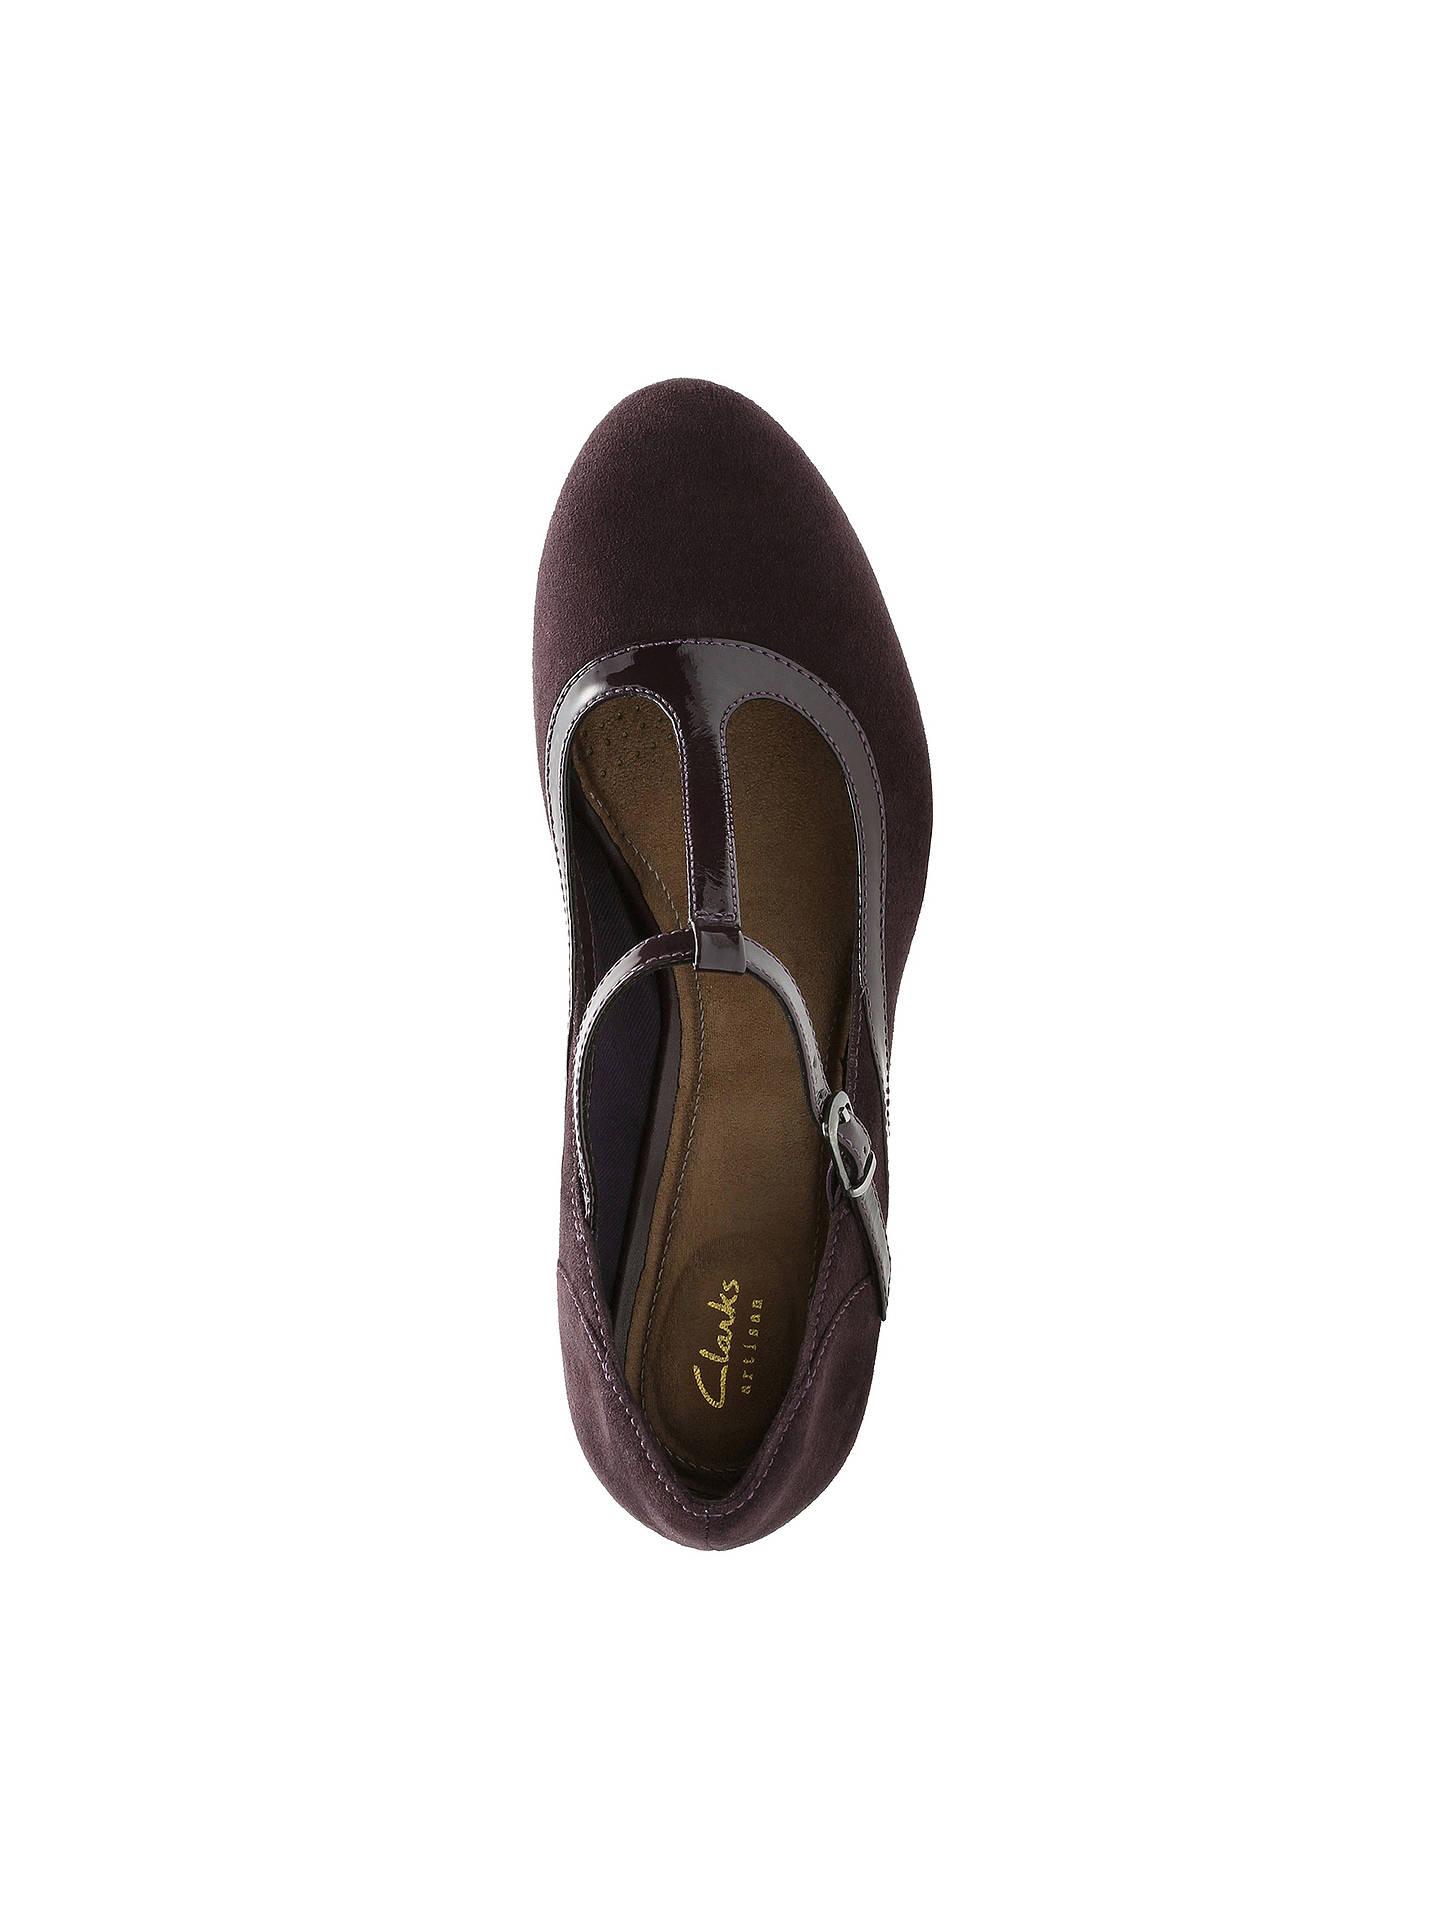 407f56c1cd3c9 ... Buy Clarks Chorus Pitch T-Bar Court Shoes, Aubergine, 4 Online at  johnlewis ...